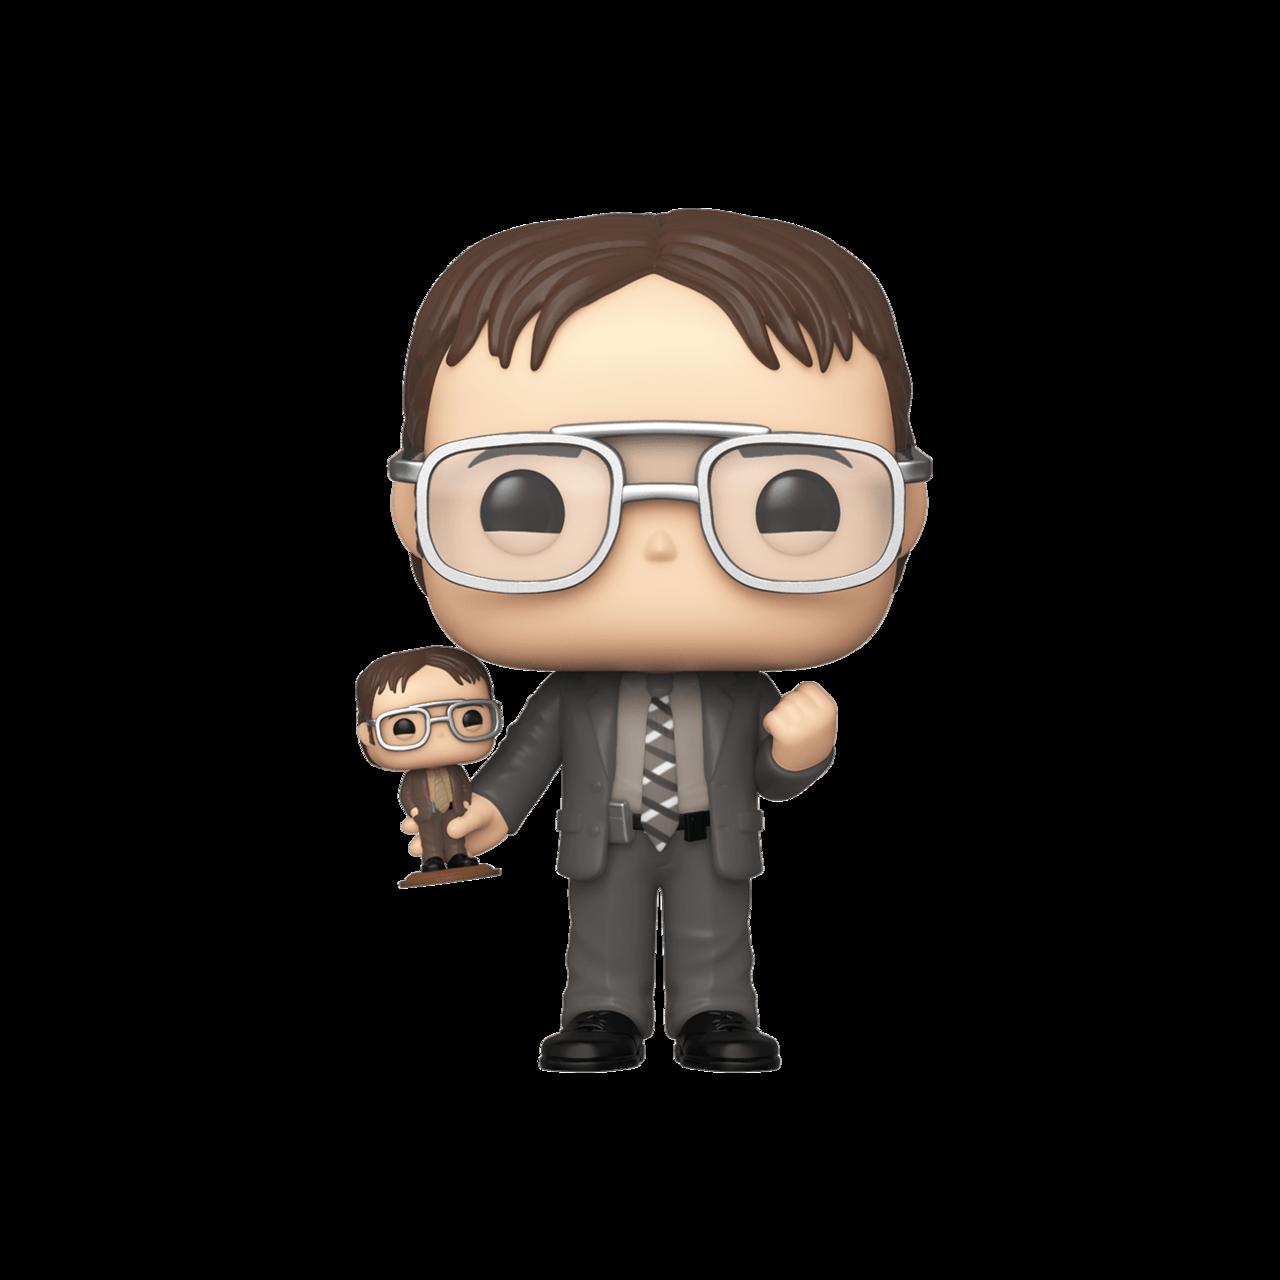 Dwight holding Dwight bobblehead